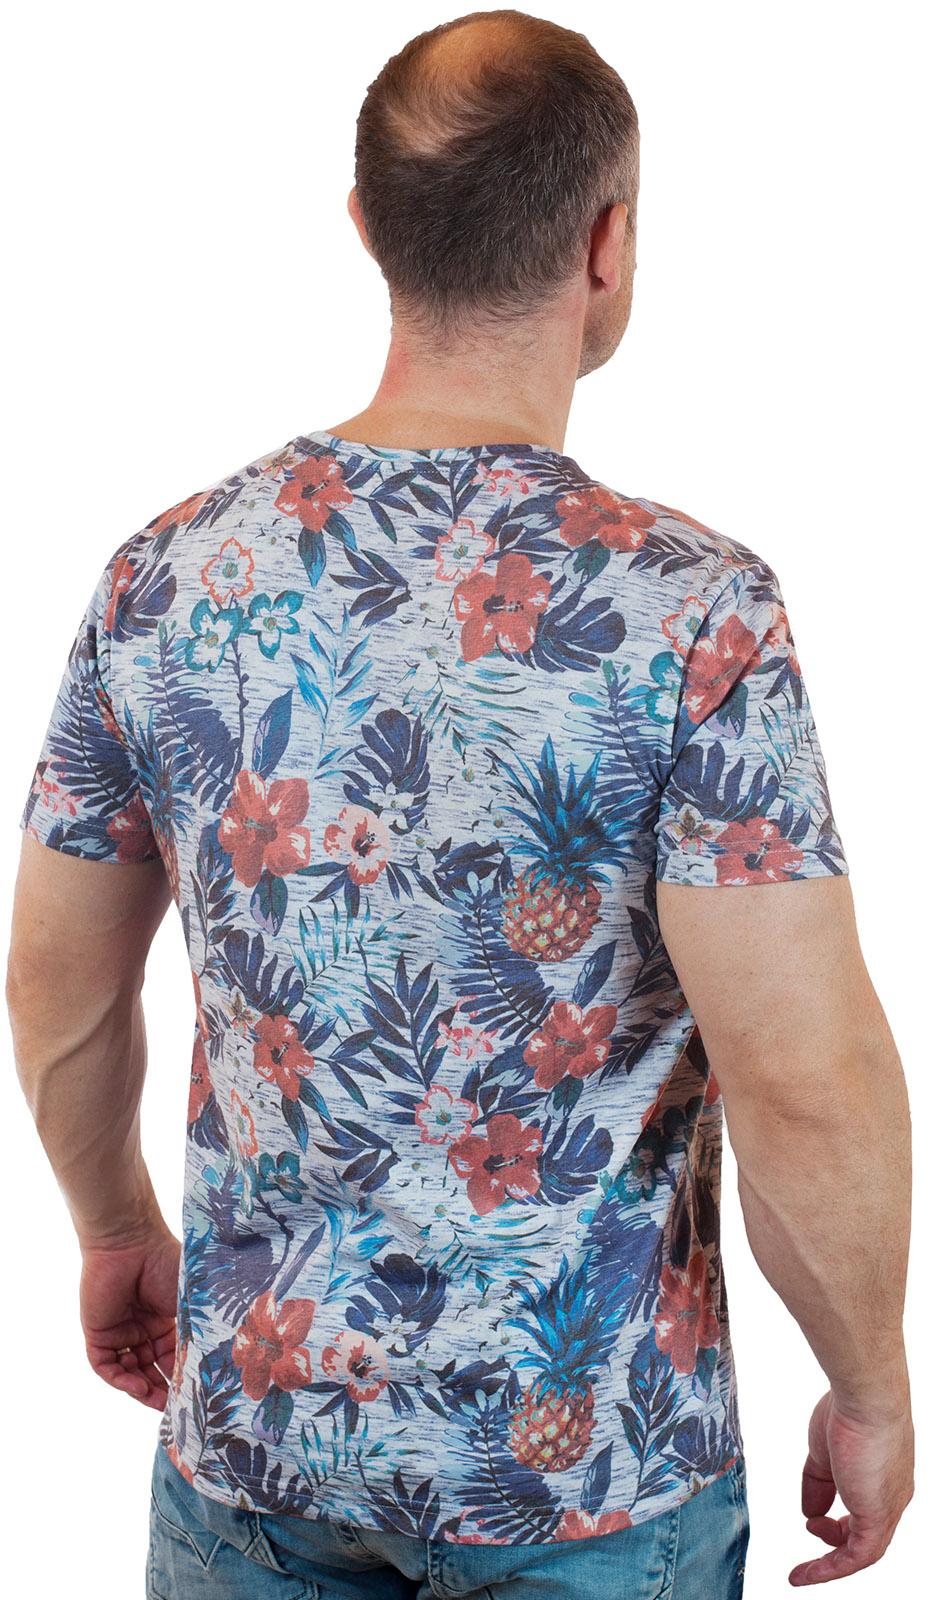 Тусовочная футболка Traditional Quality Trademark с доставкой